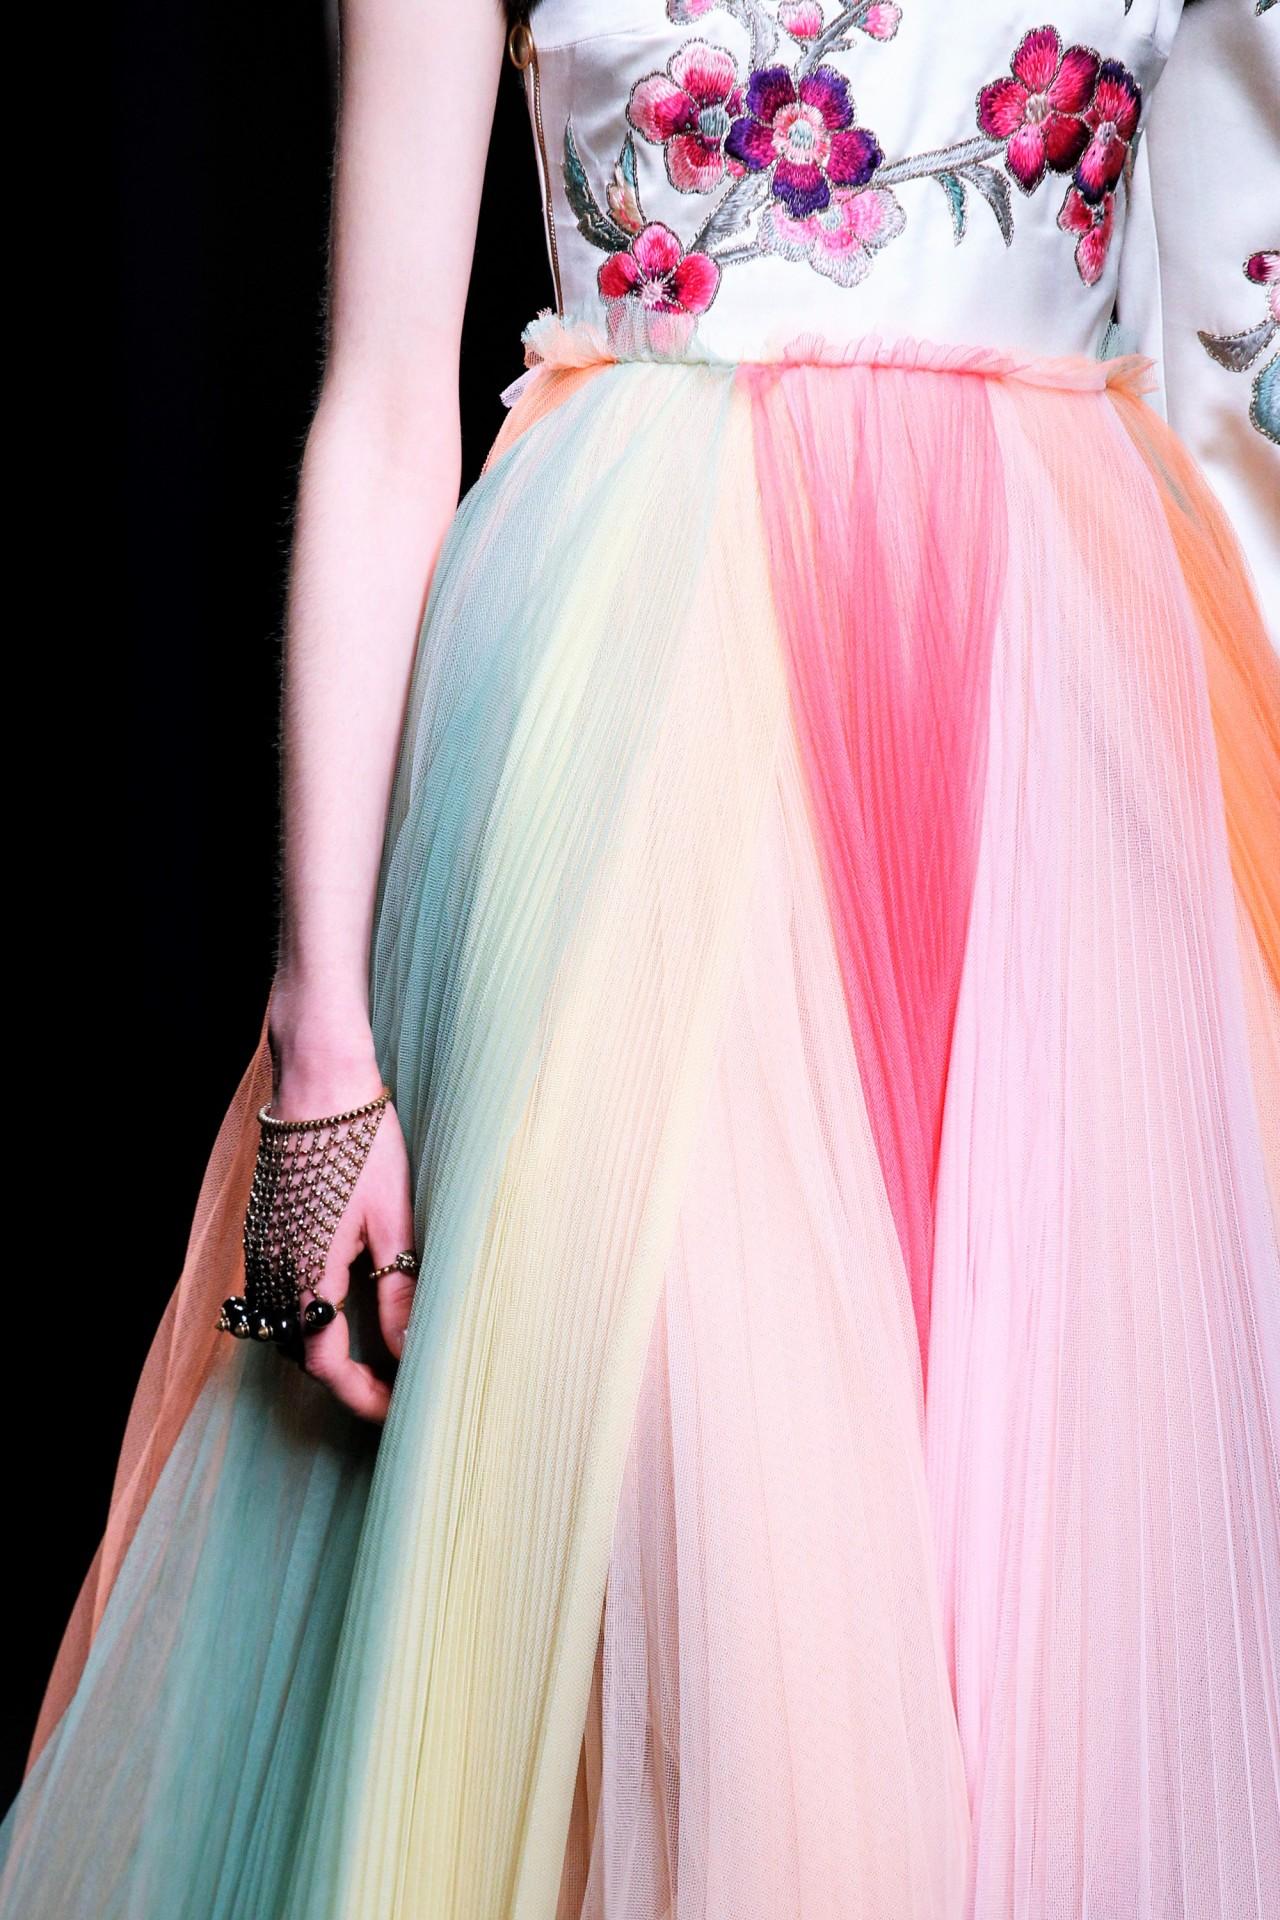 Najljepše haljine - Page 21 Tumblr_o35lhrDUCj1szuns8o1_1280